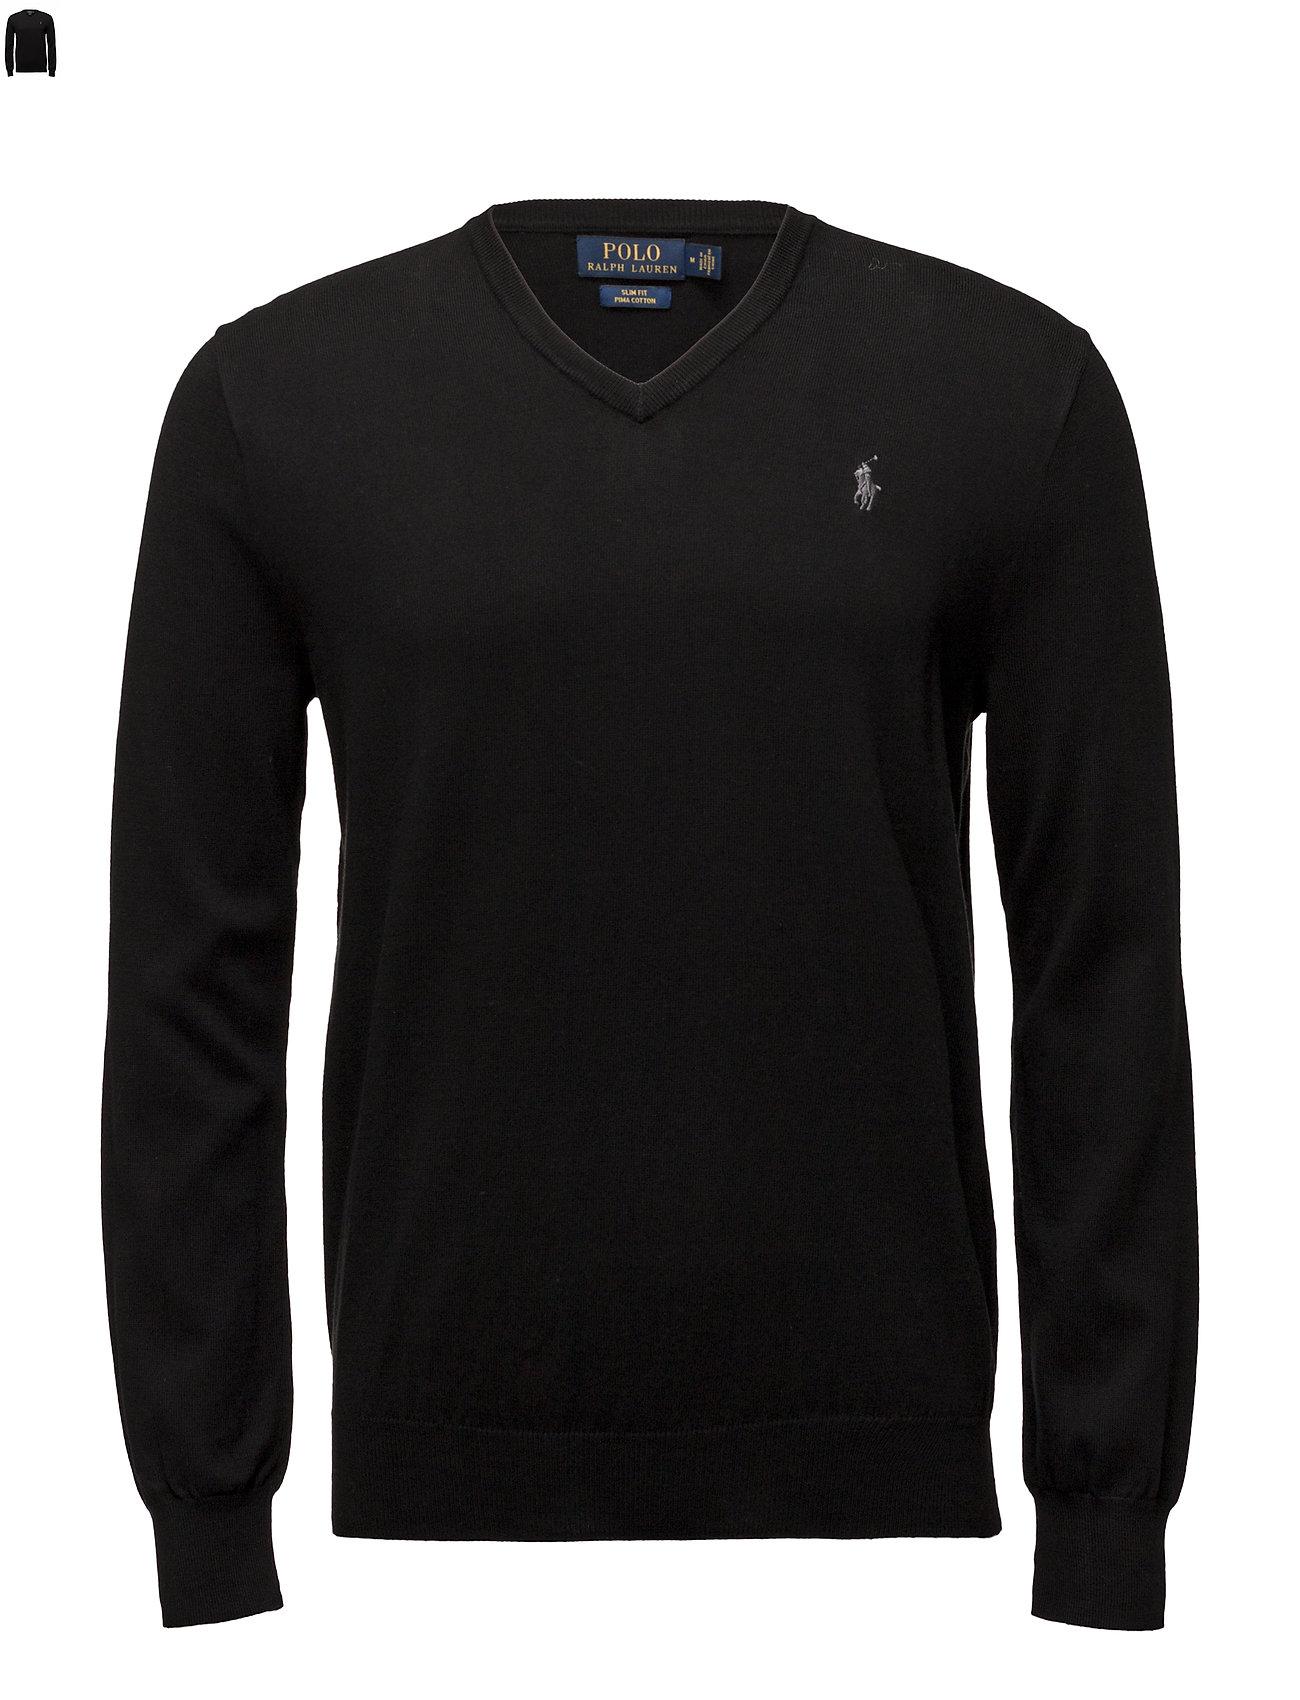 Polo Ralph Lauren Slim Fit Cotton V-Neck Sweater - POLO BLACK